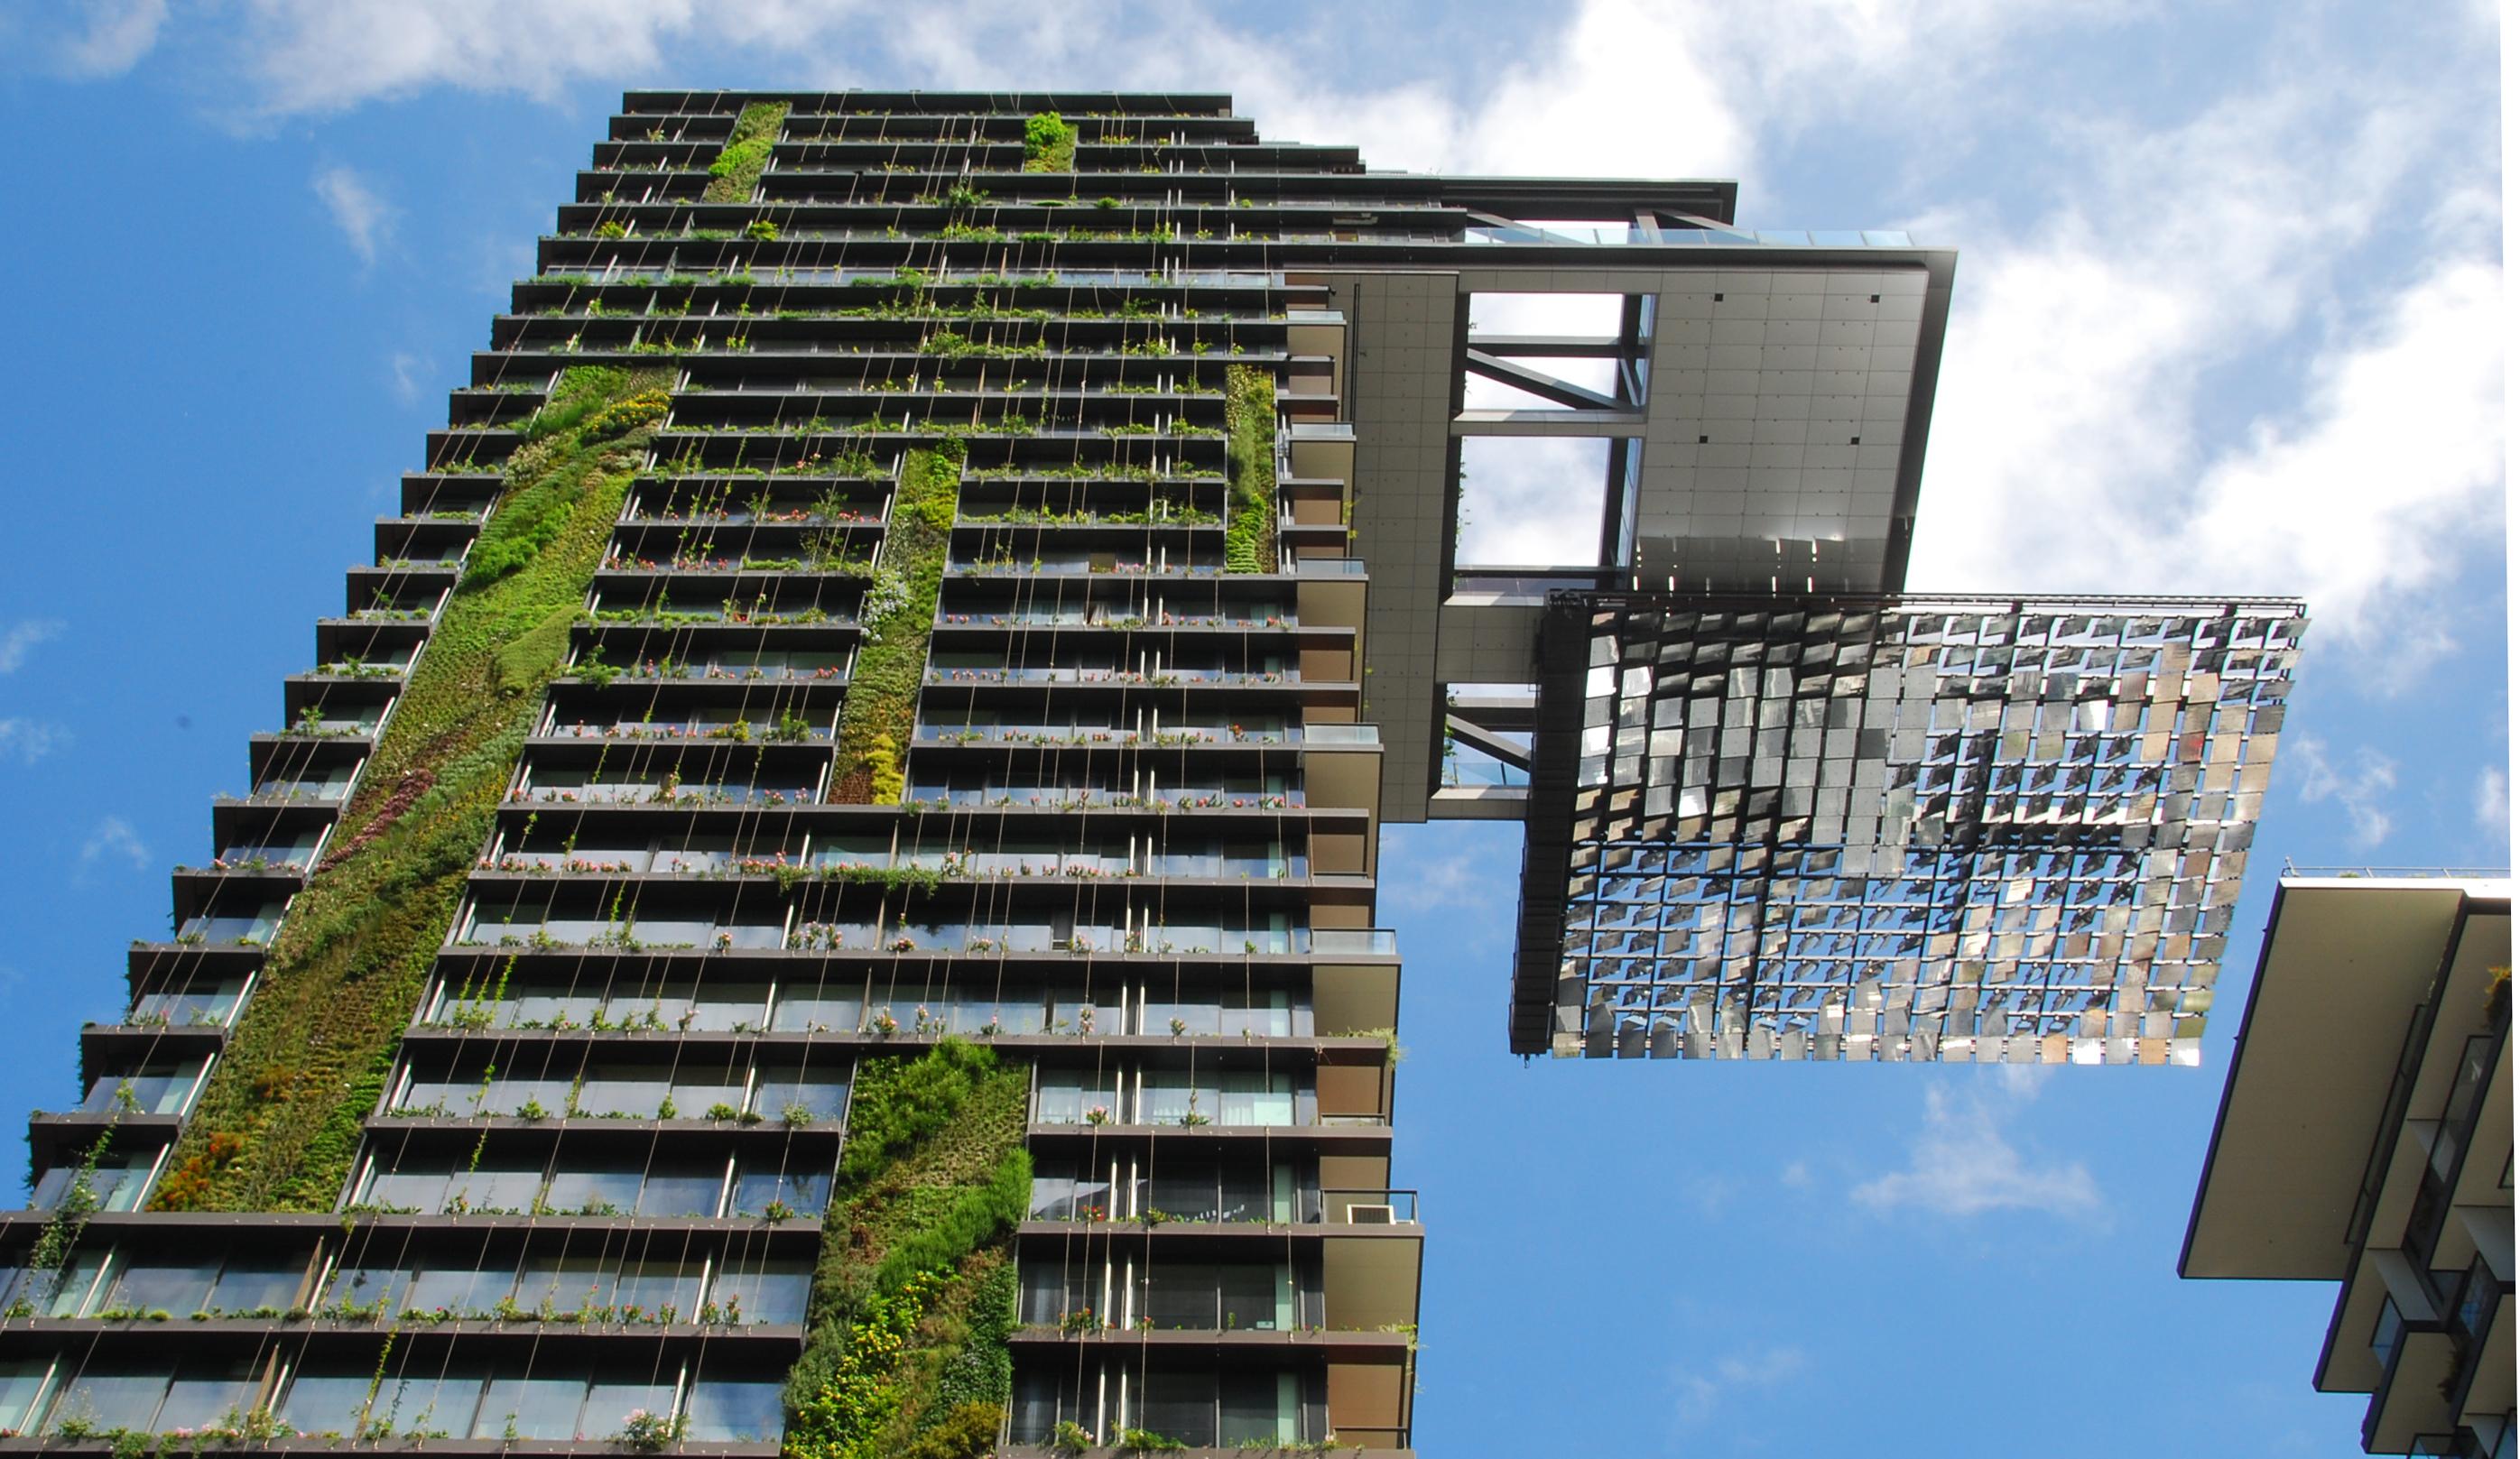 Components Regarding Green Architecture